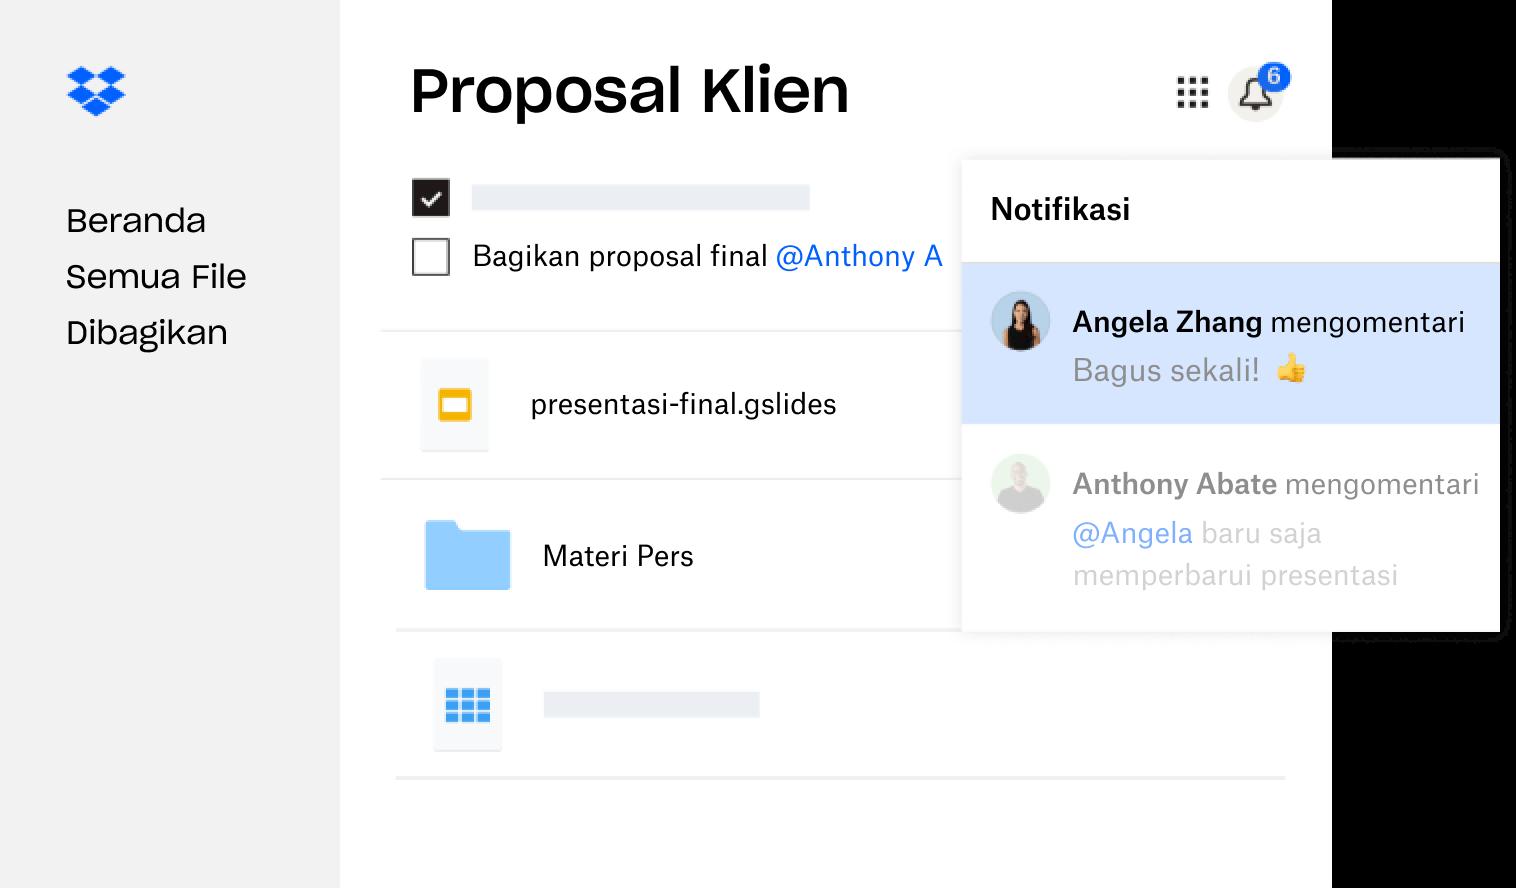 Sebuah proposal klien yang dibuat di Dropbox dibagikan kepada banyak pengguna yang memberikan umpan balik